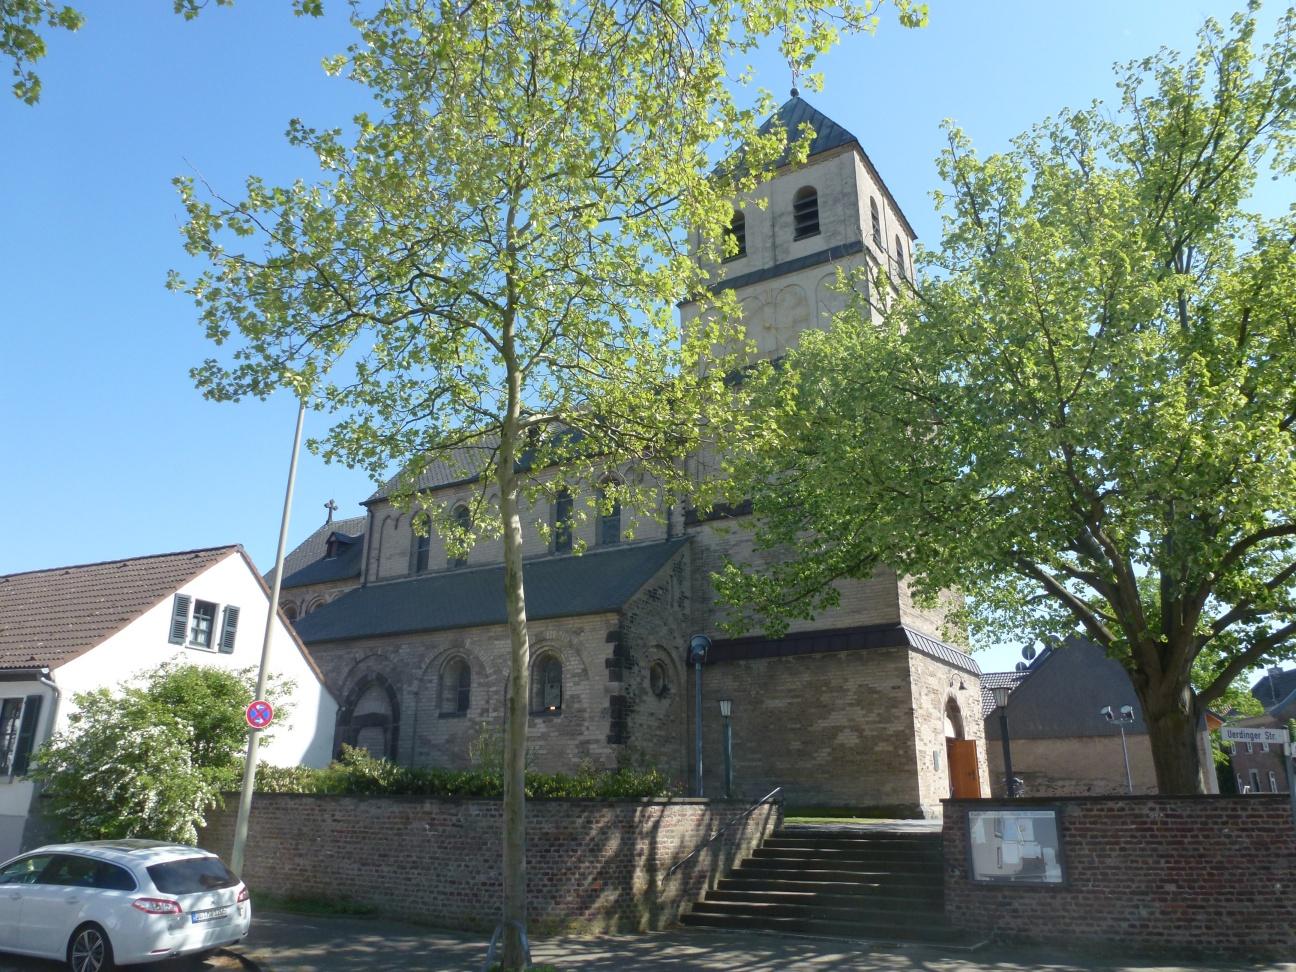 St. Dionysius, Mündelheim (© Hermann-Josef Brandt)